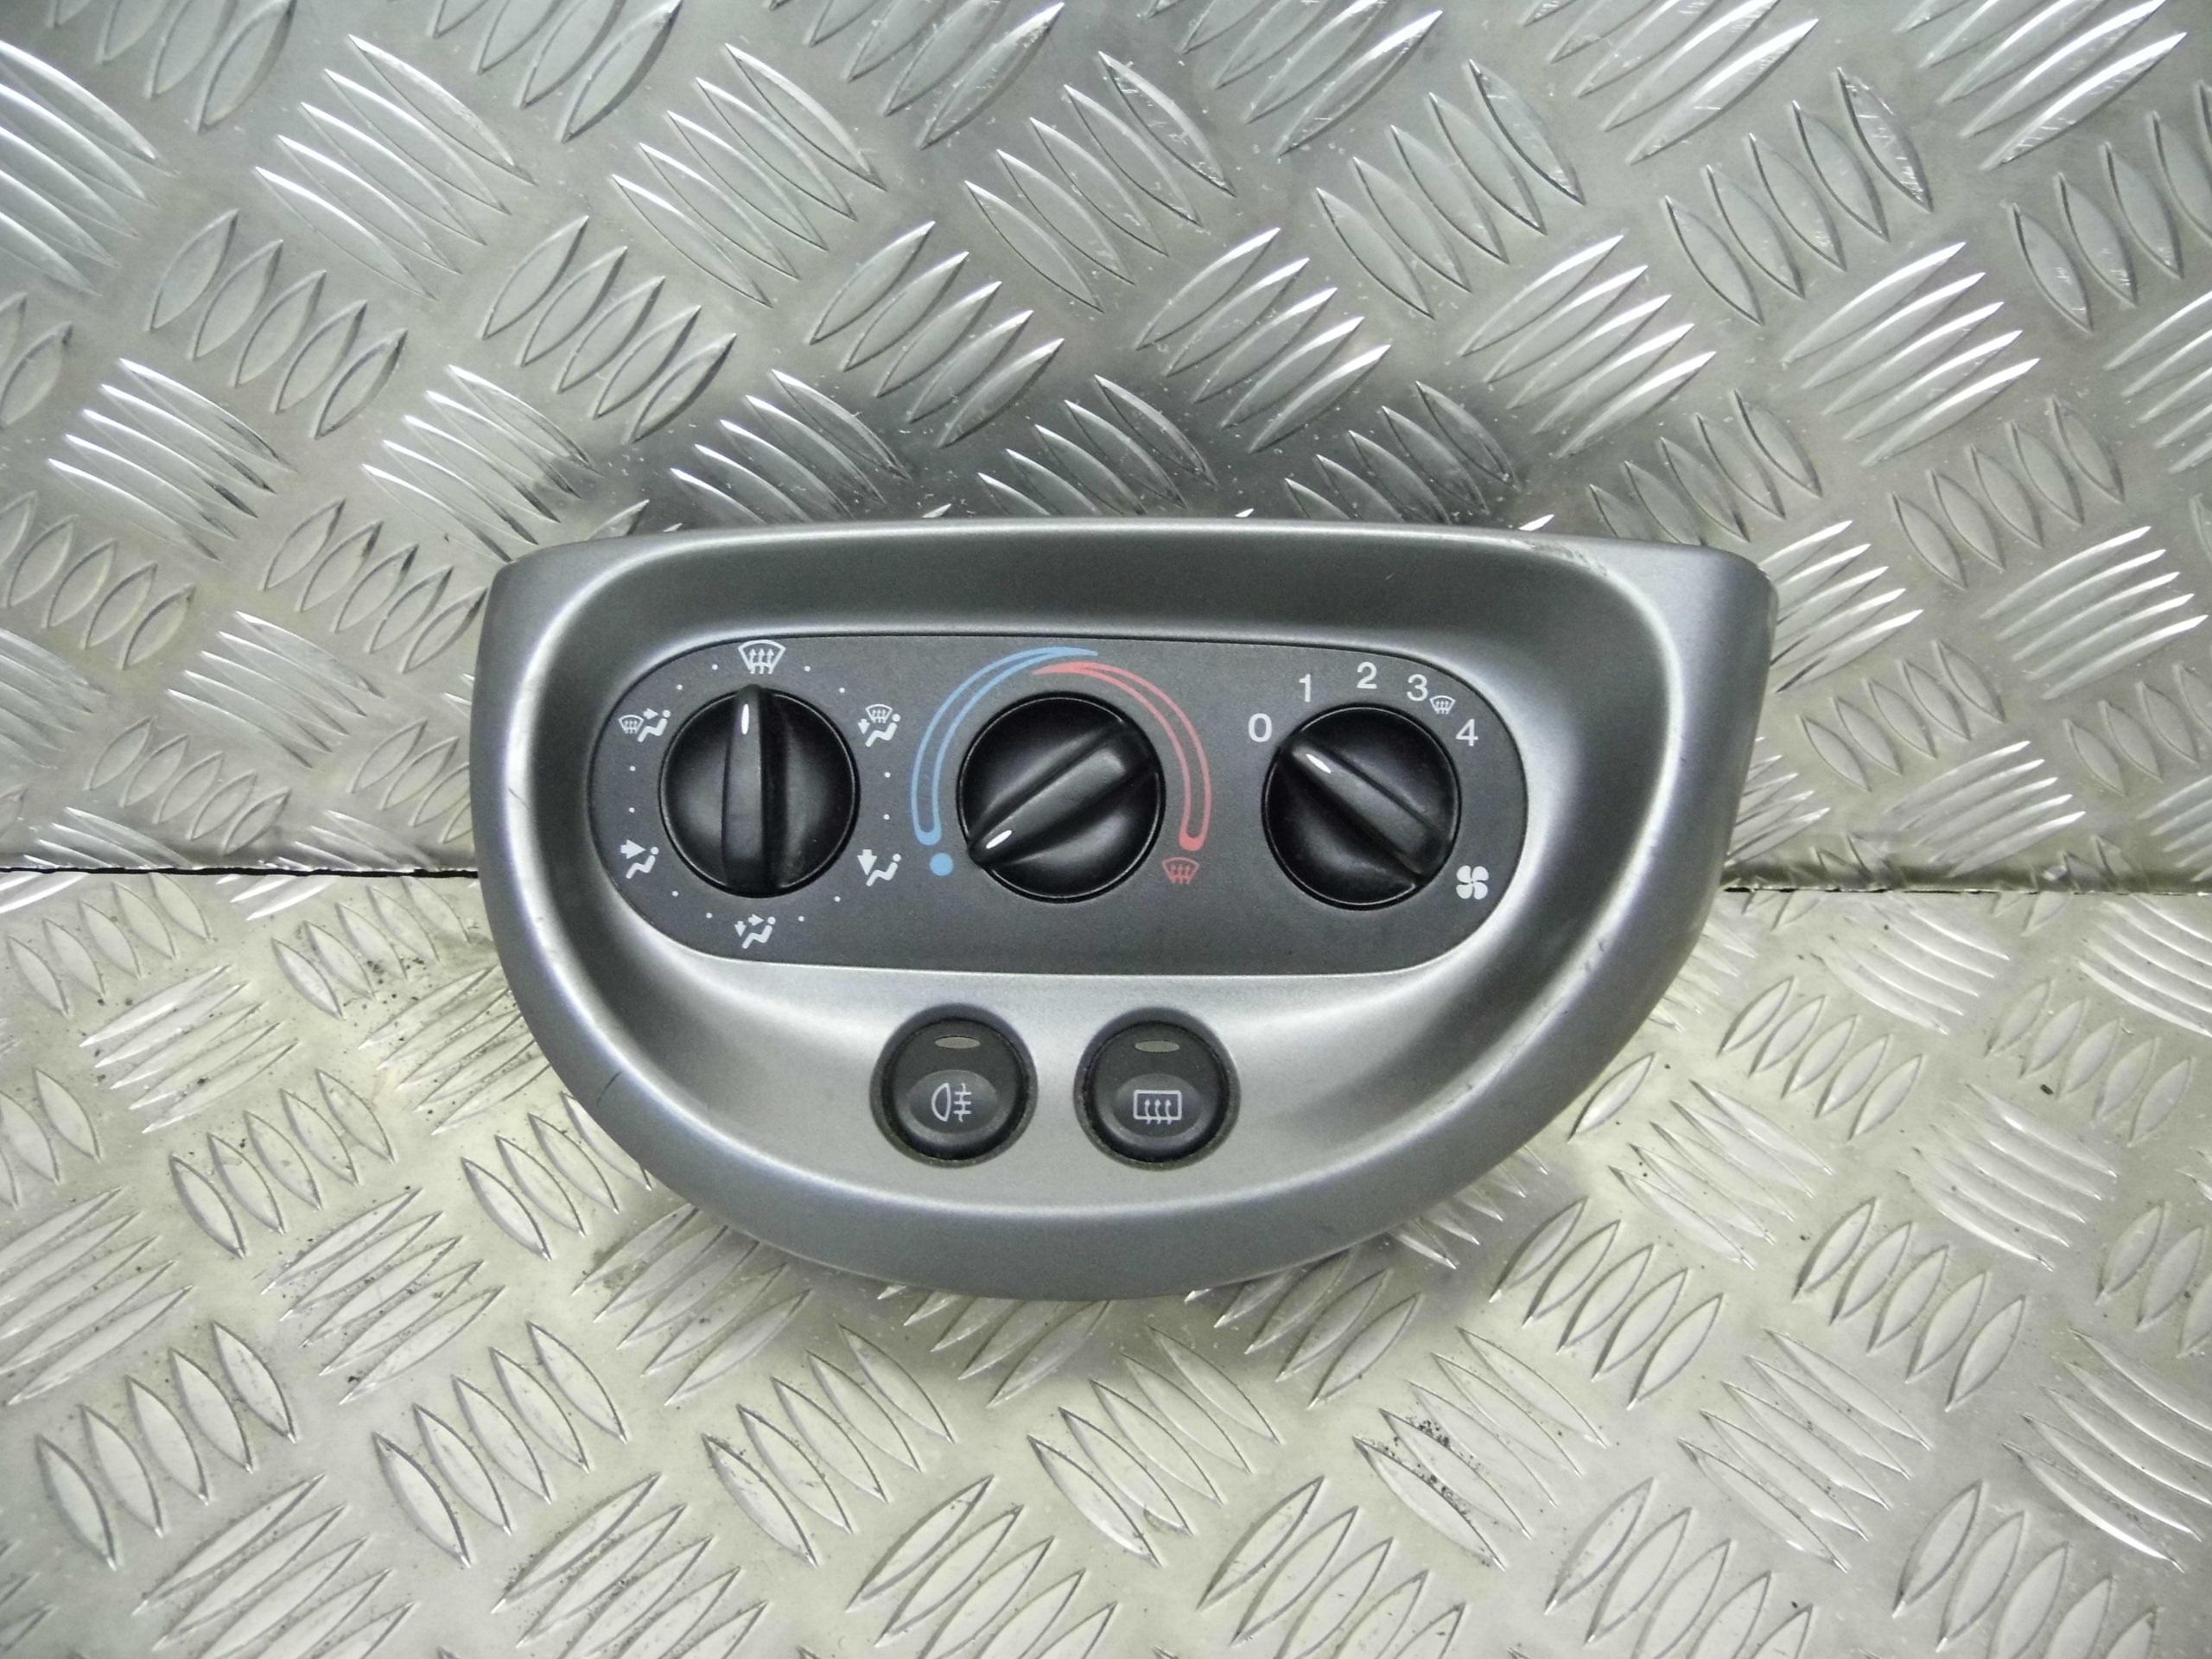 Used 2002 Ford Ka Hatchback Heater Control Panel